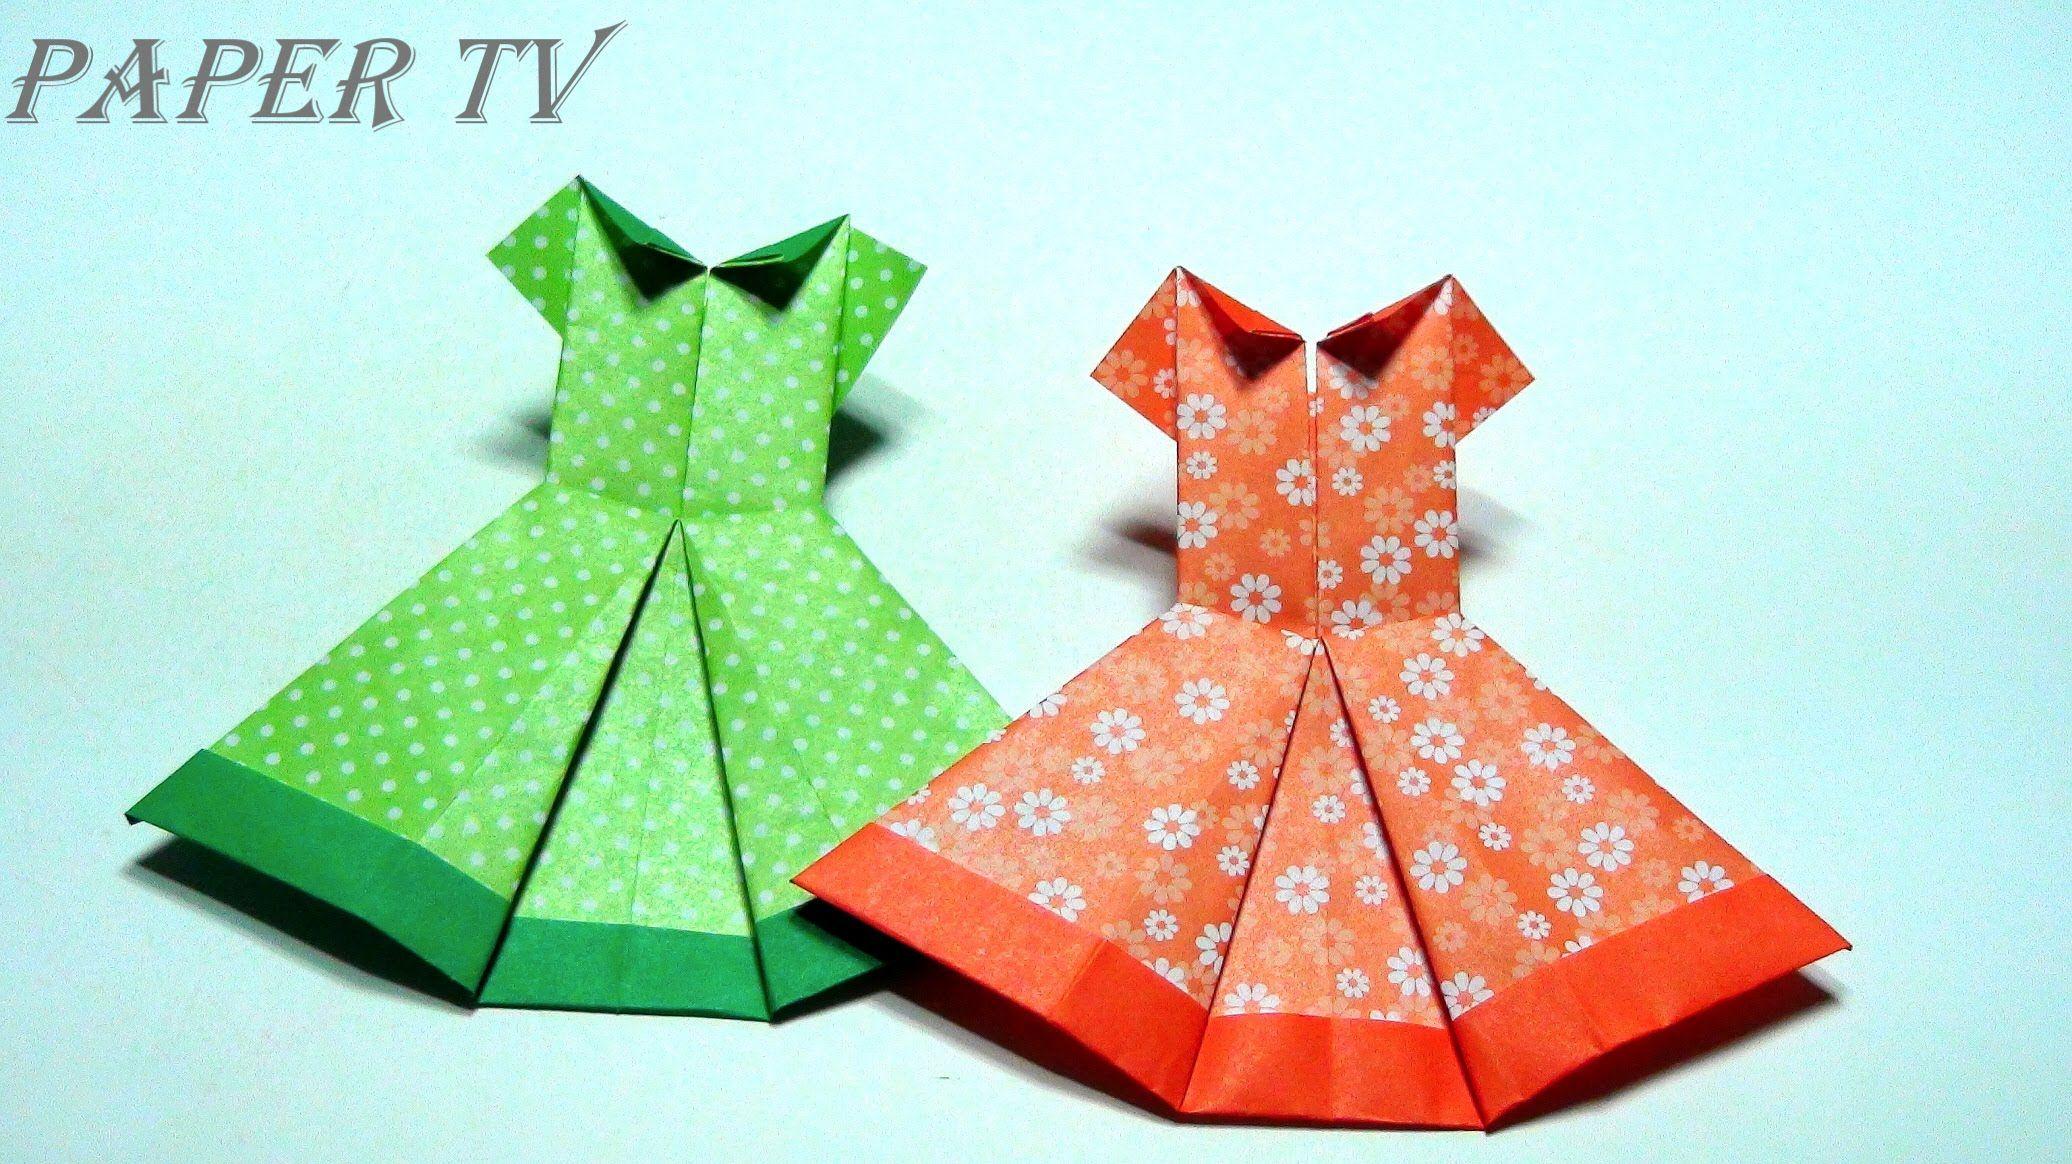 Paper Tv Origami Dress 종이접기 드레스 折り紙 ドレス Como